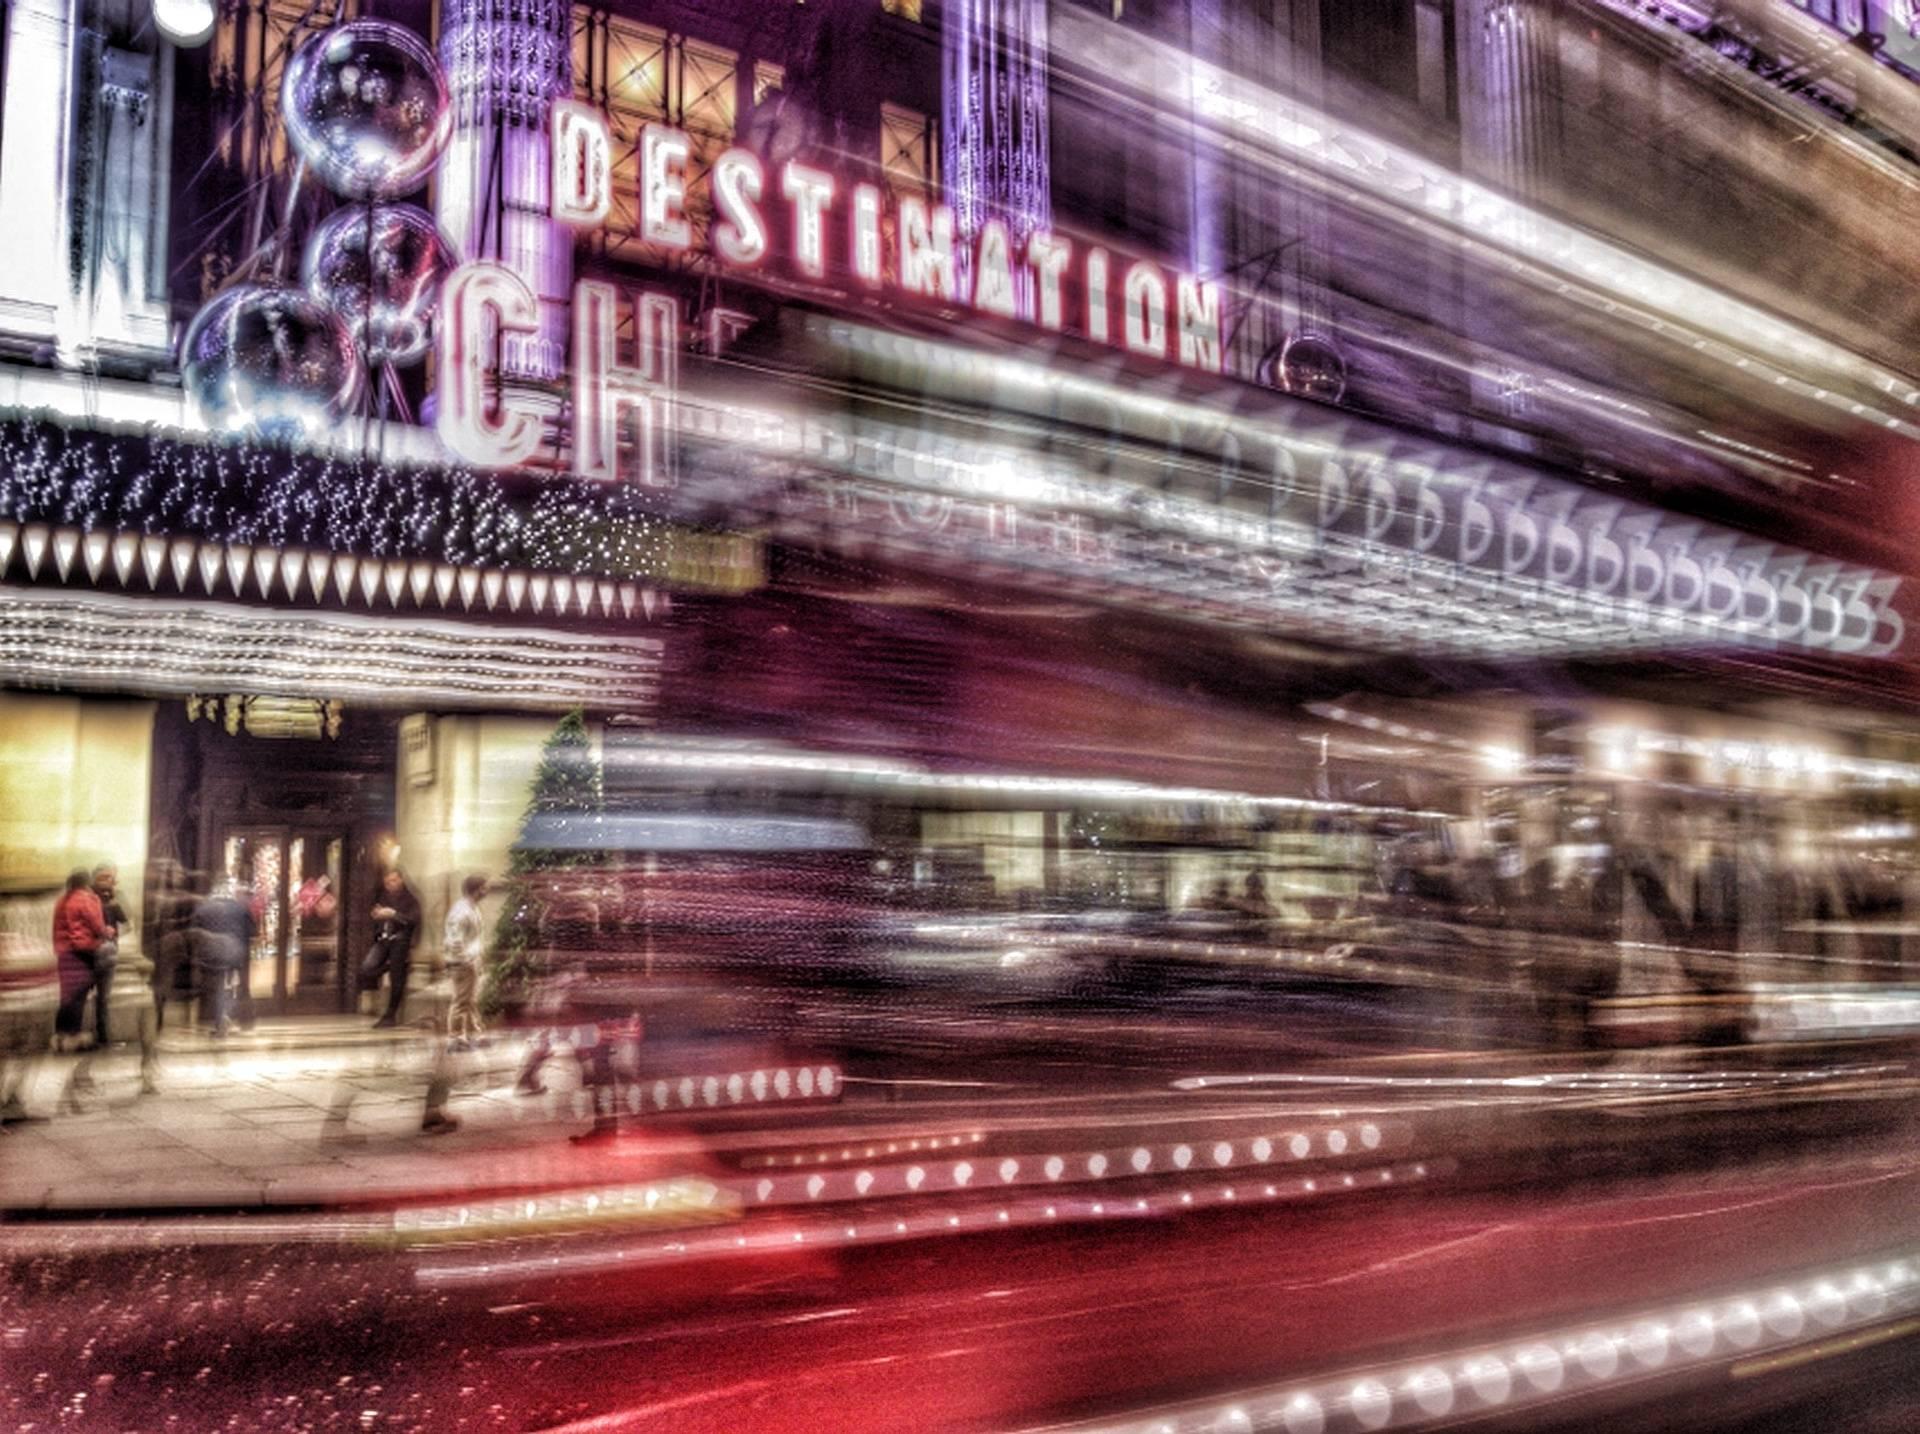 #DestinationChristmas - Selfridges London